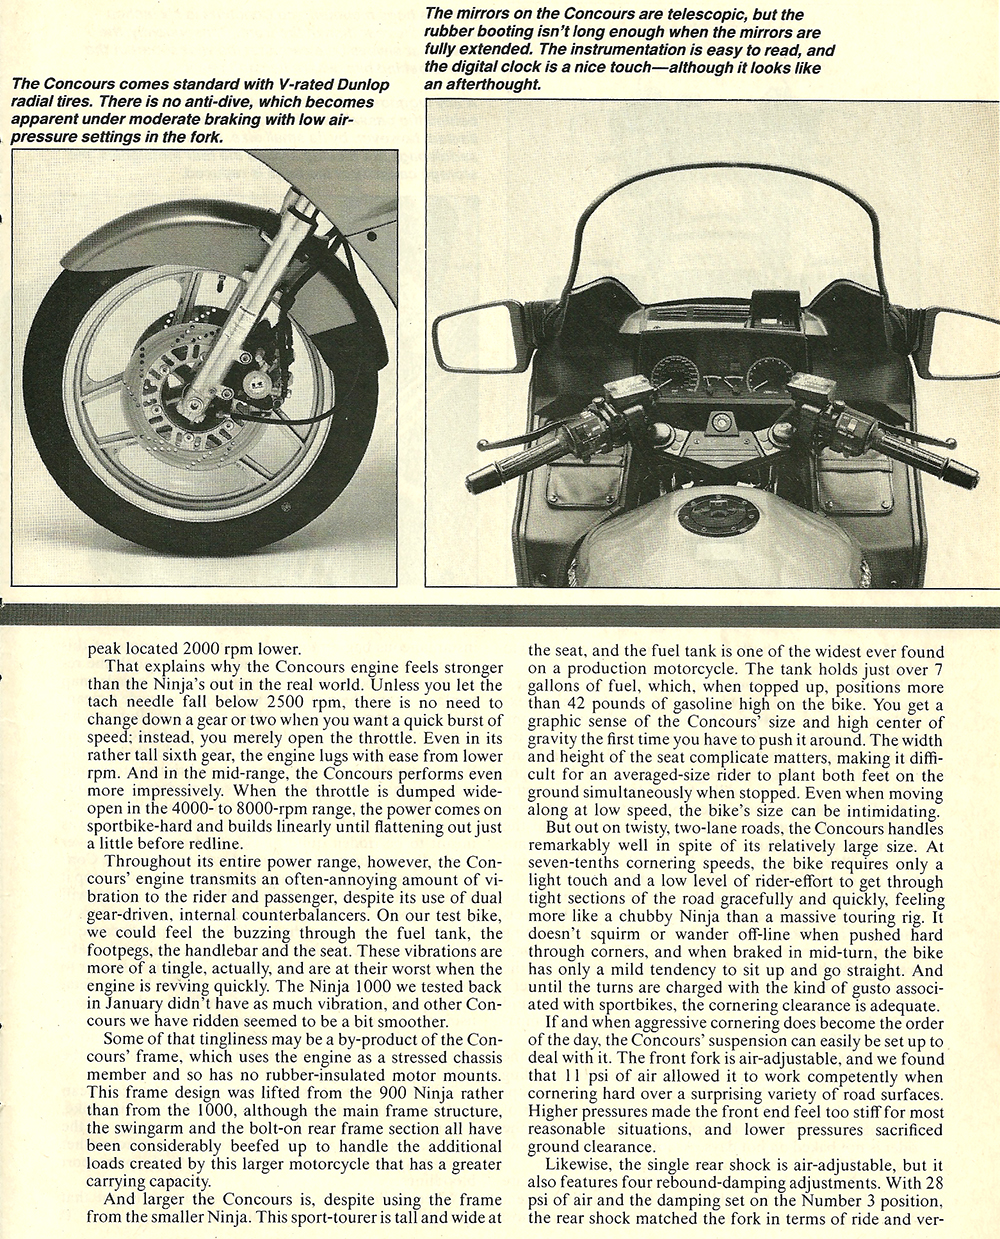 1986 Kawasaki 1000 Concours road test 04.jpg